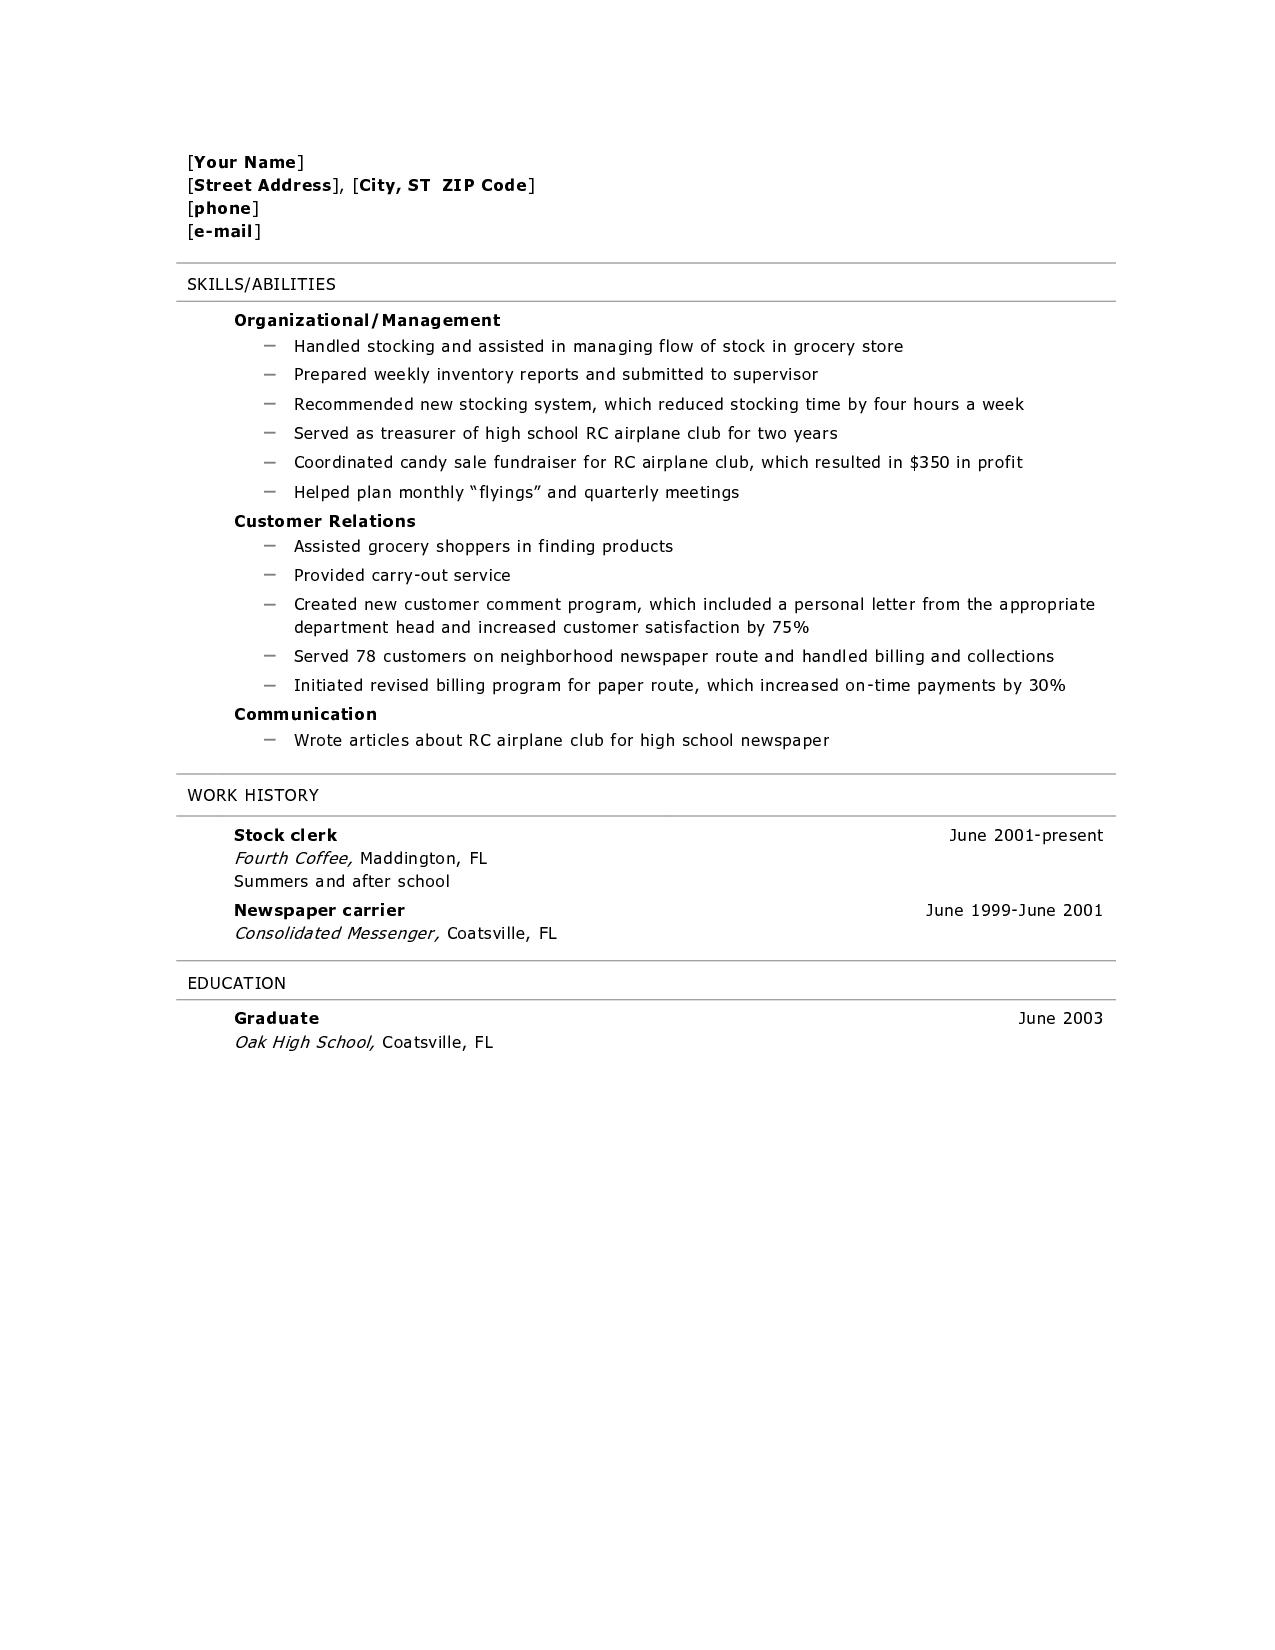 Sample Resume For Graduate School